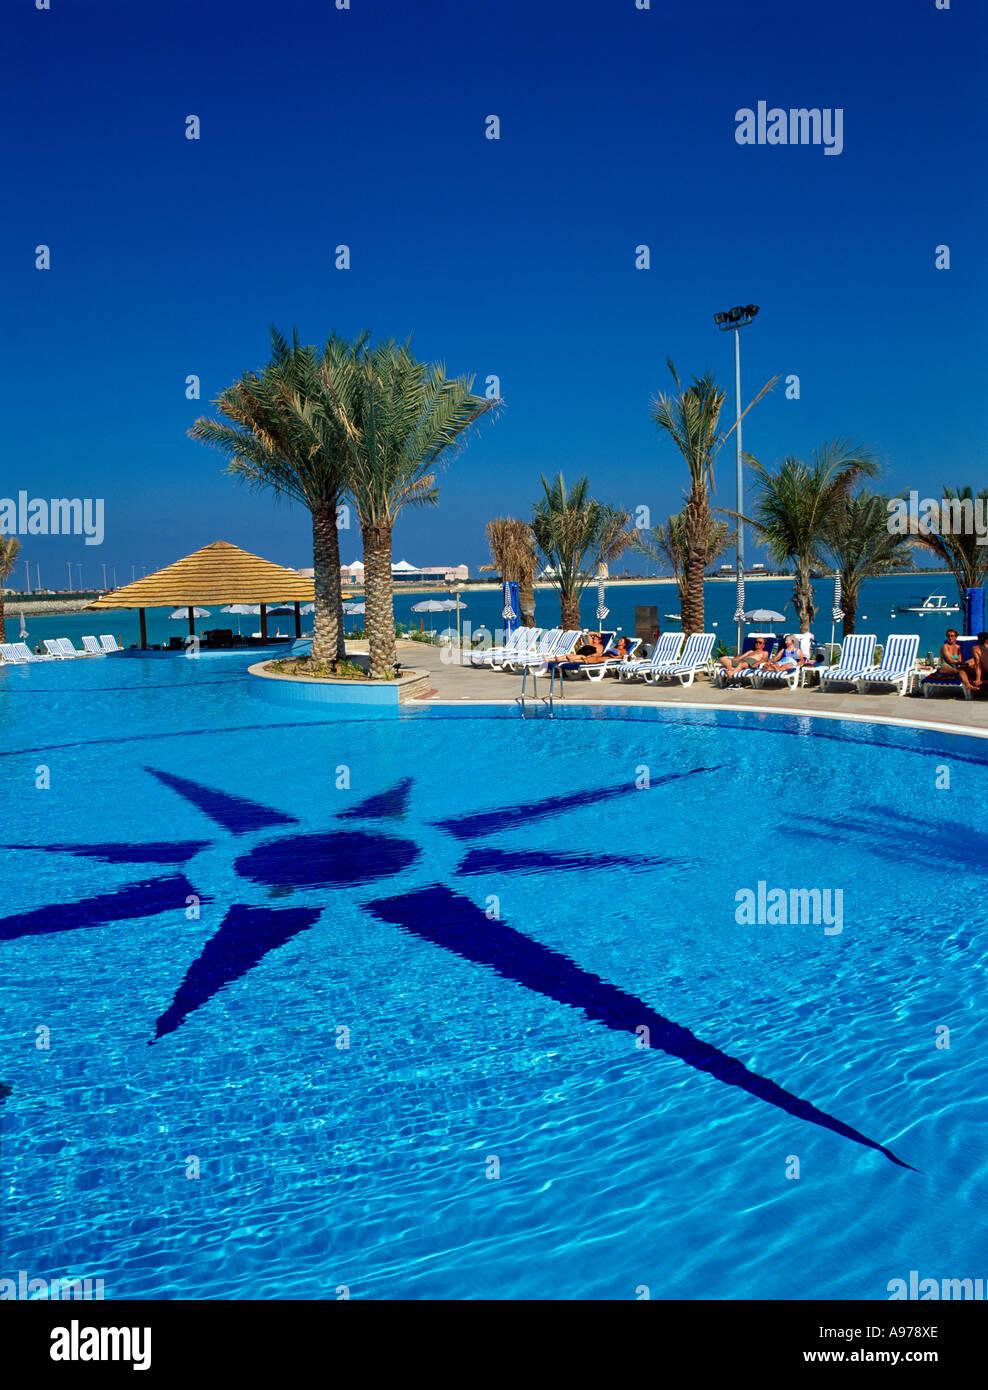 Hilton abu dhabi stock photos hilton abu dhabi stock - Swimming pool construction companies in uae ...